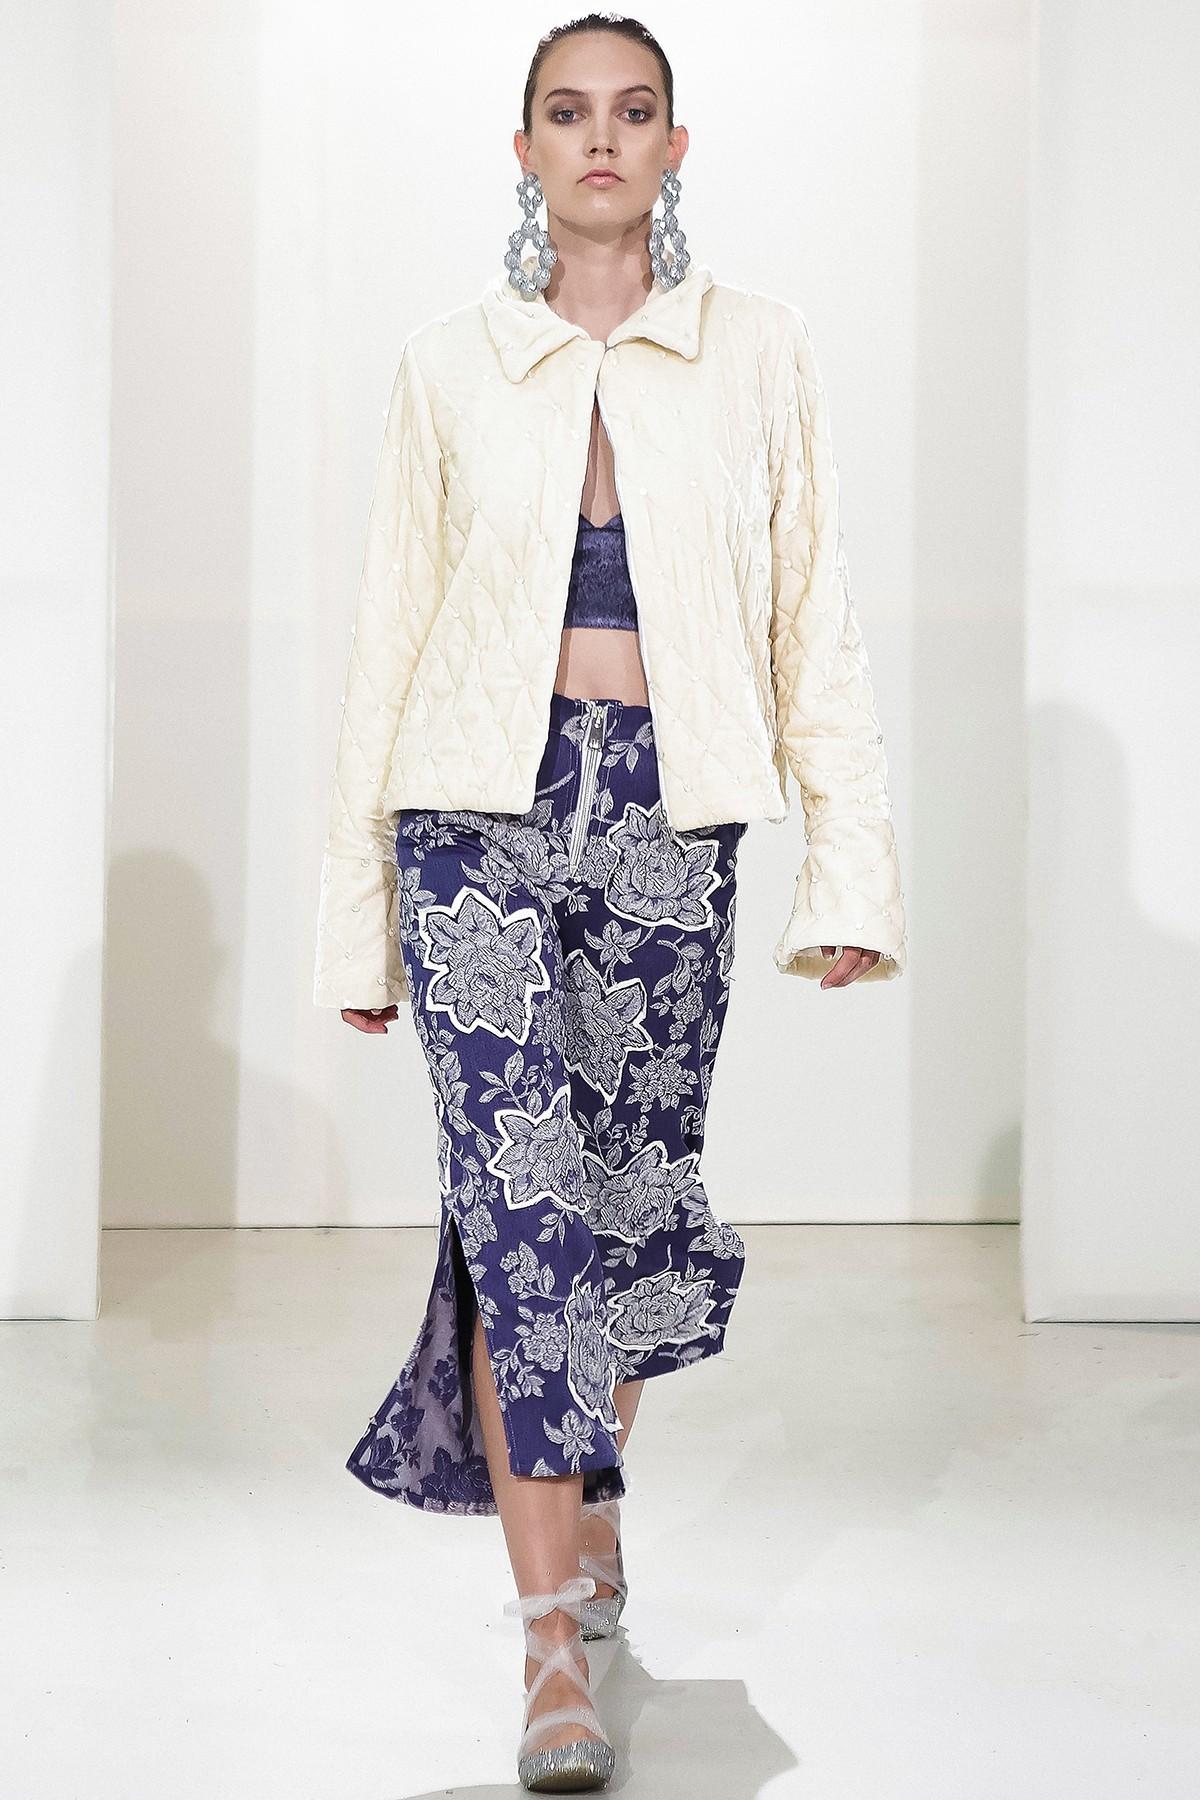 emesebako_best_romaniandesigner__fabulous_muses_fashion_icon_interview